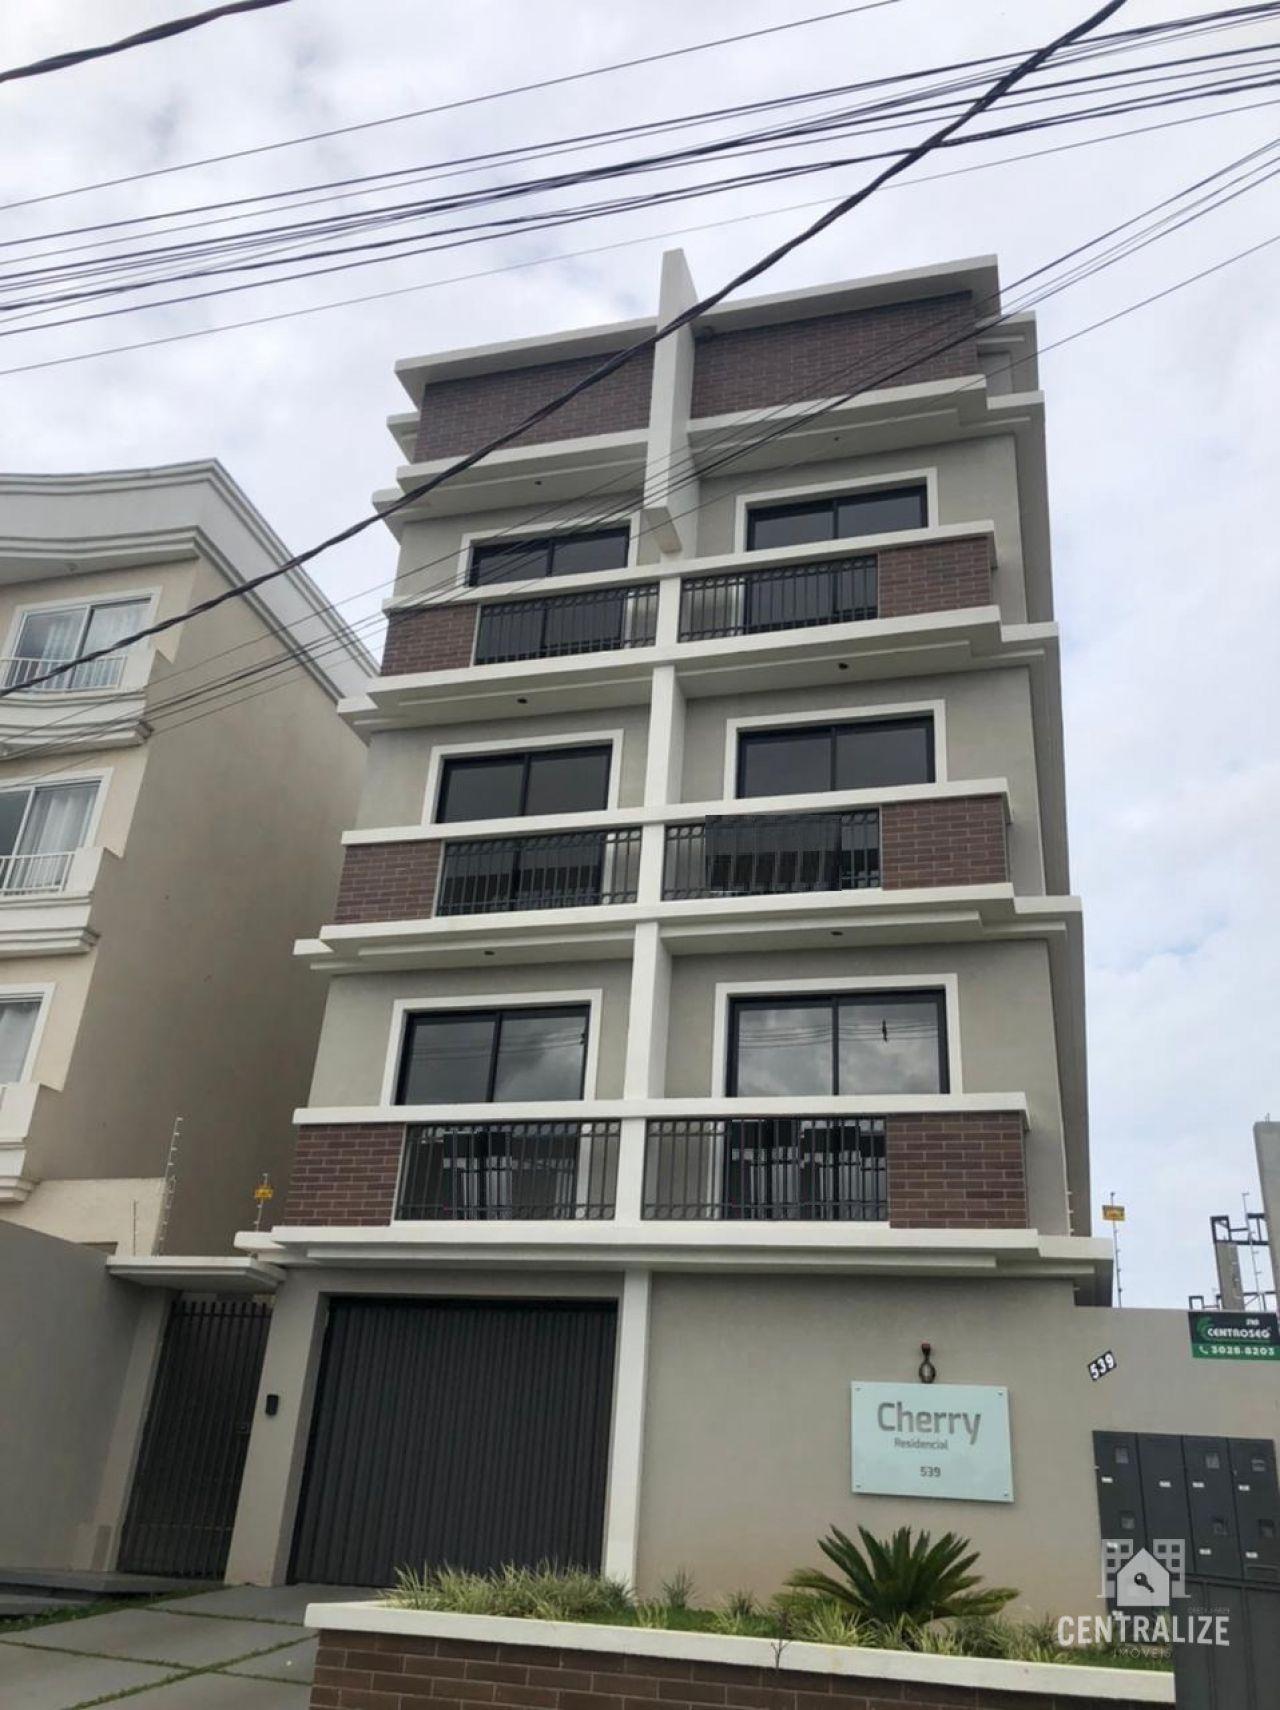 <strong>Apartamento à venda - Edifício Cherry</strong>